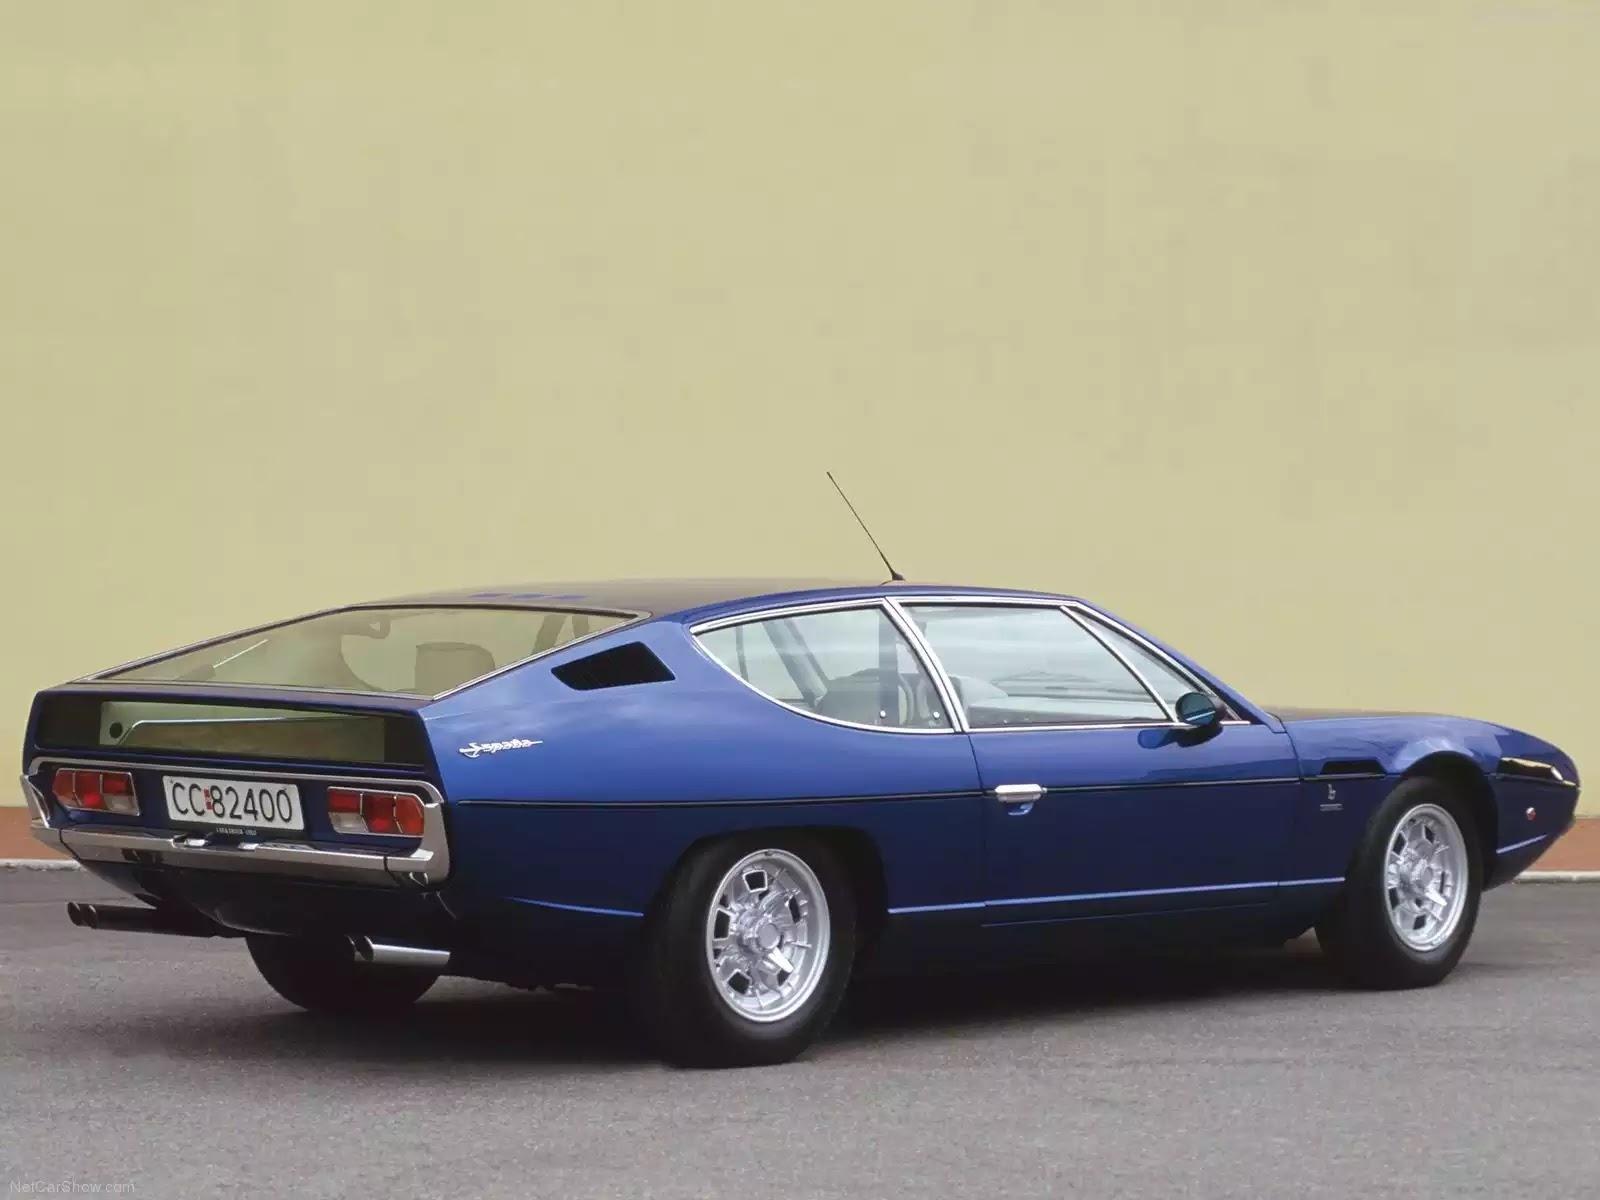 Hình ảnh siêu xe Lamborghini Espada 1968 & nội ngoại thất